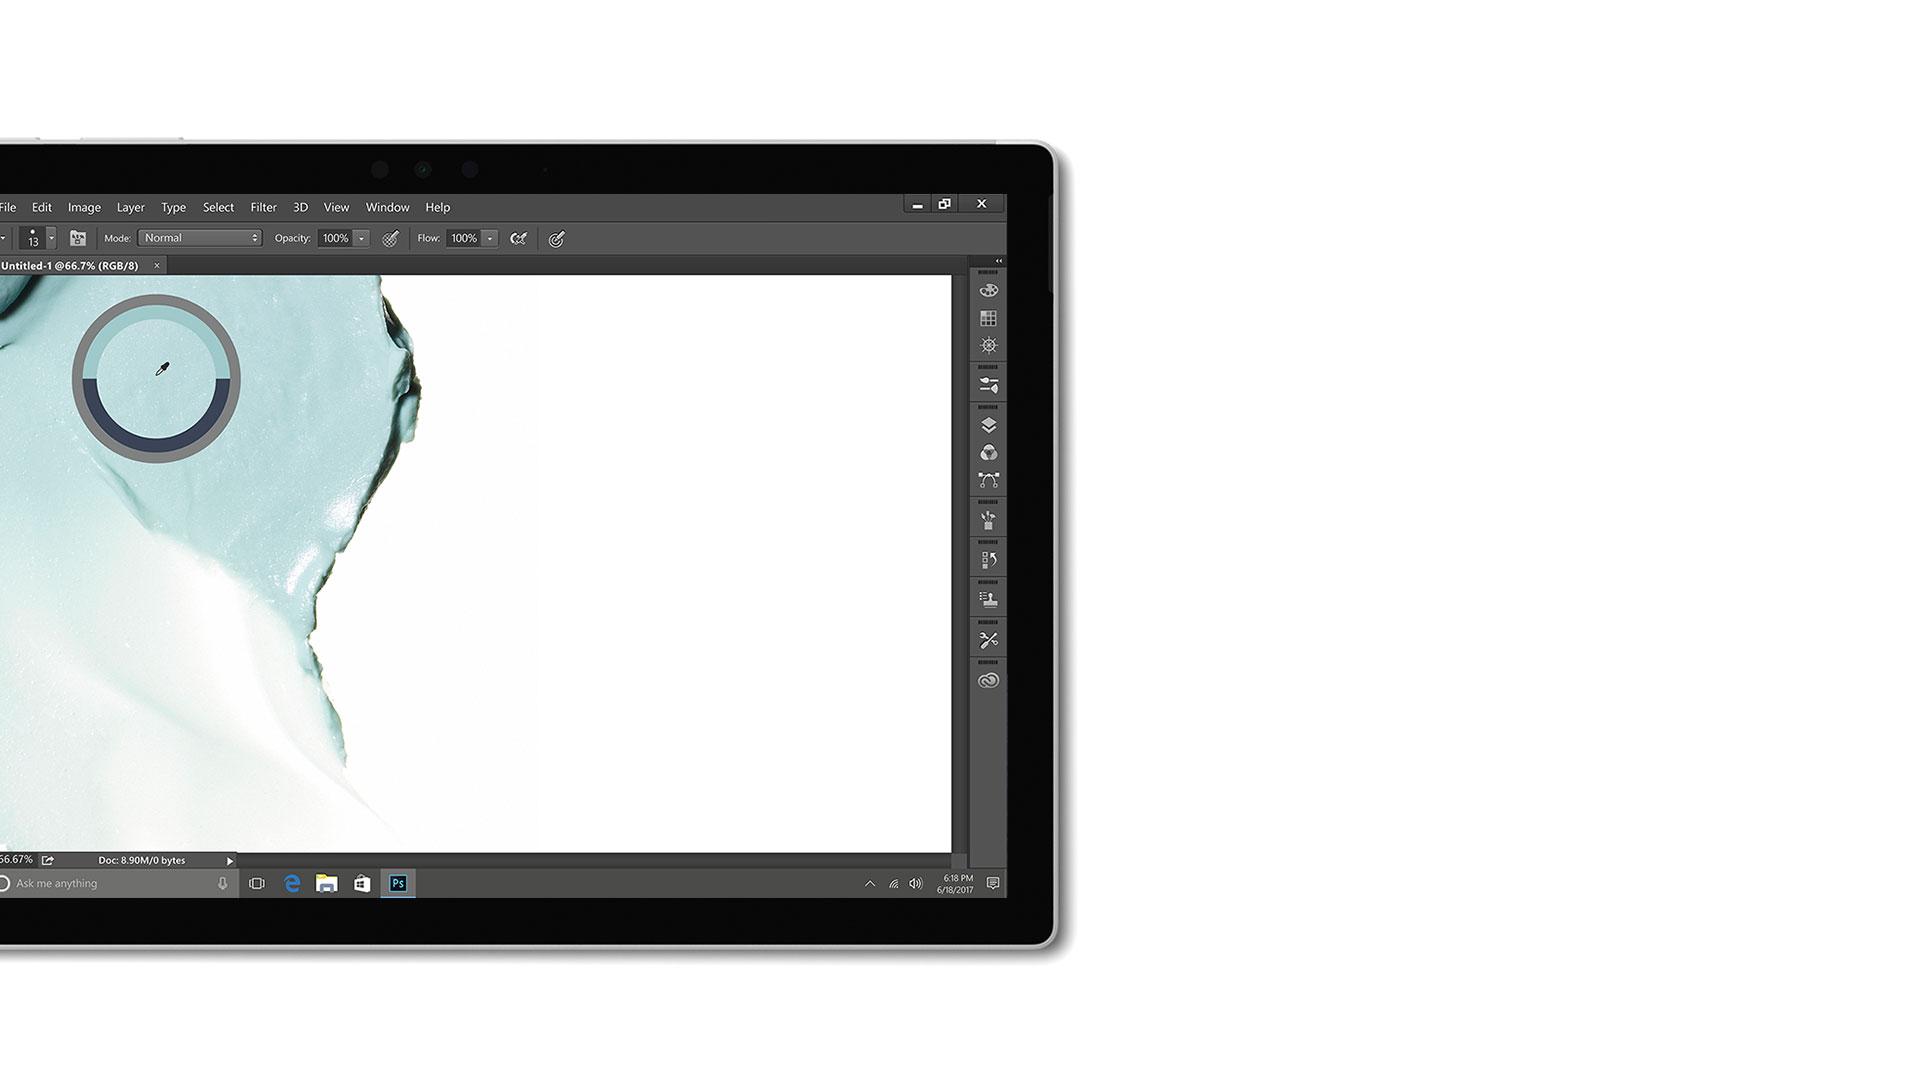 Adobe Creative Cloud의 사용자 인터페이스 이미지